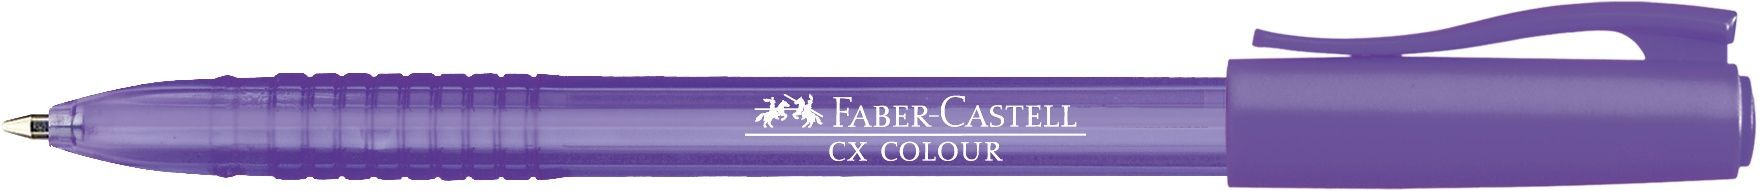 ROLLER 1MM SEMI-GEL CX COLOUR VIOLET FABER-CASTELL